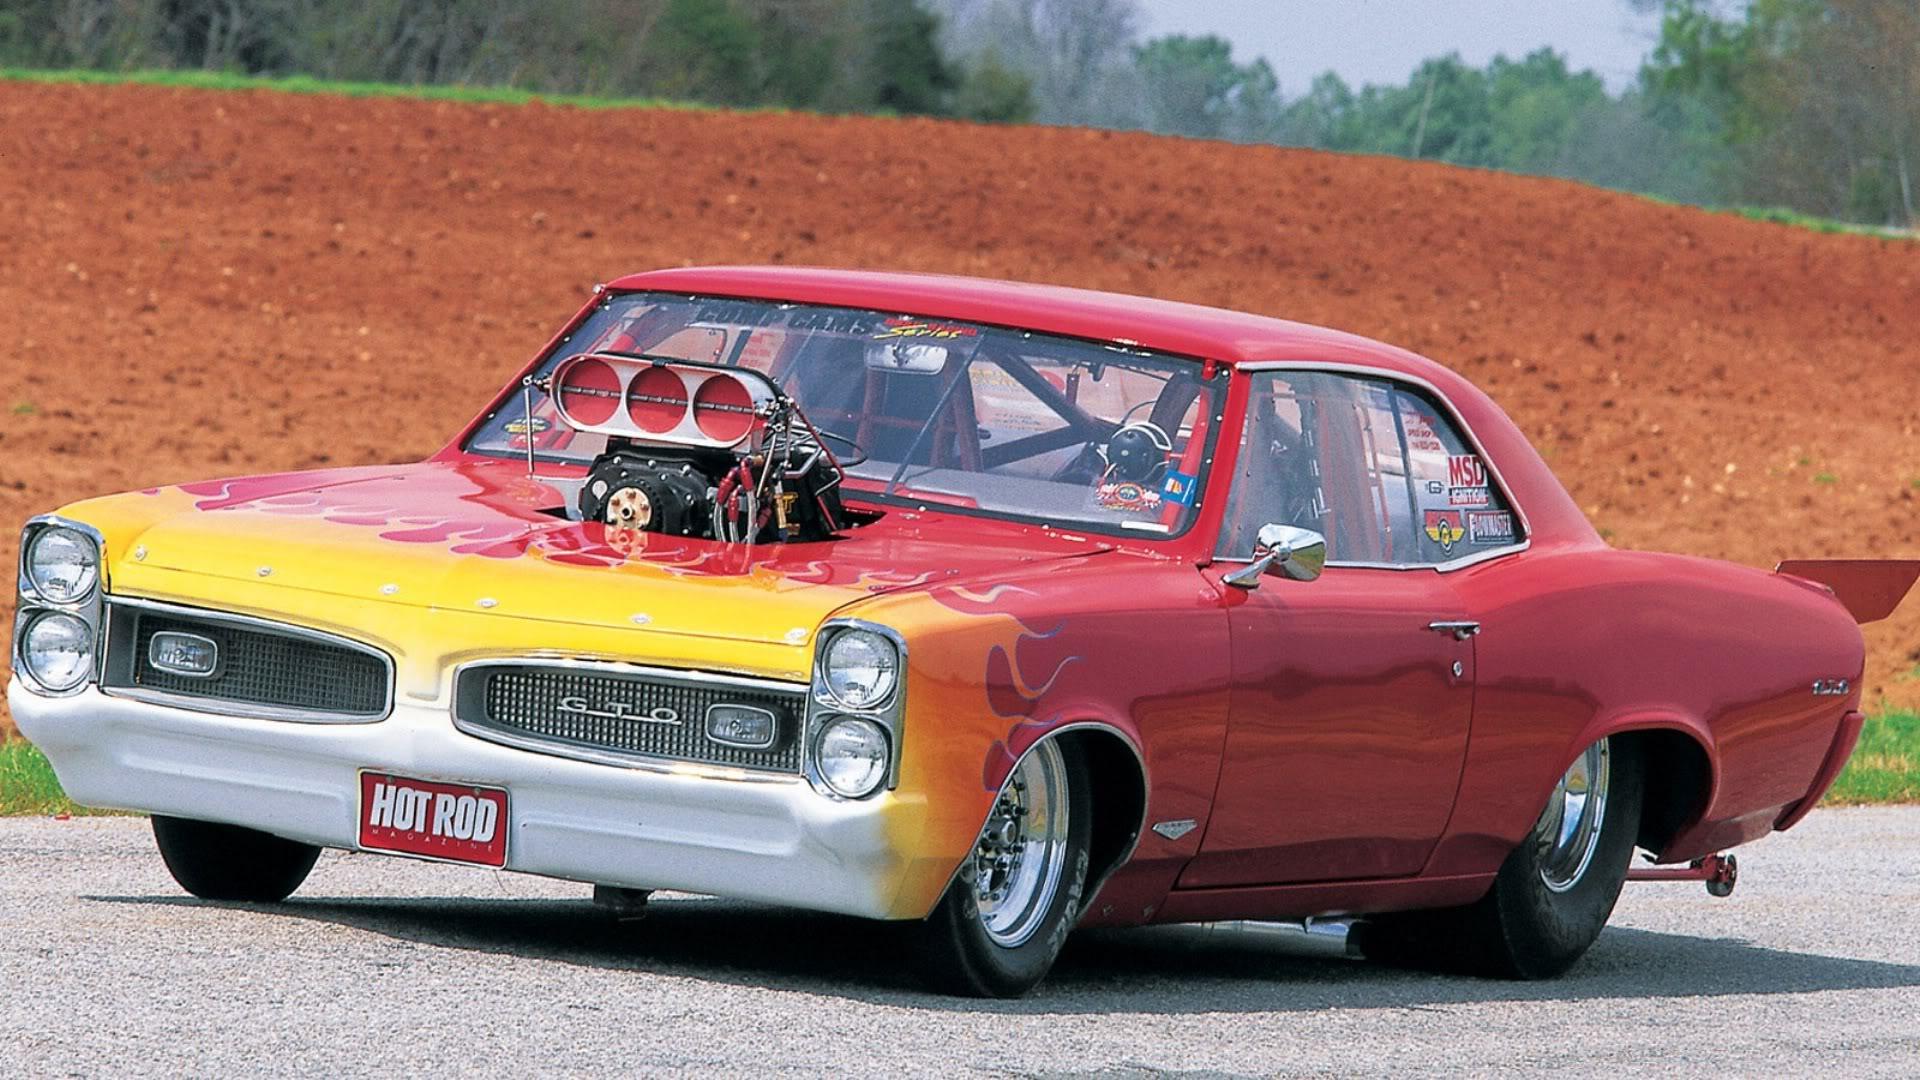 Pontiac Gto Drag Racing Hot Rod Muscle Cars Engine Blown